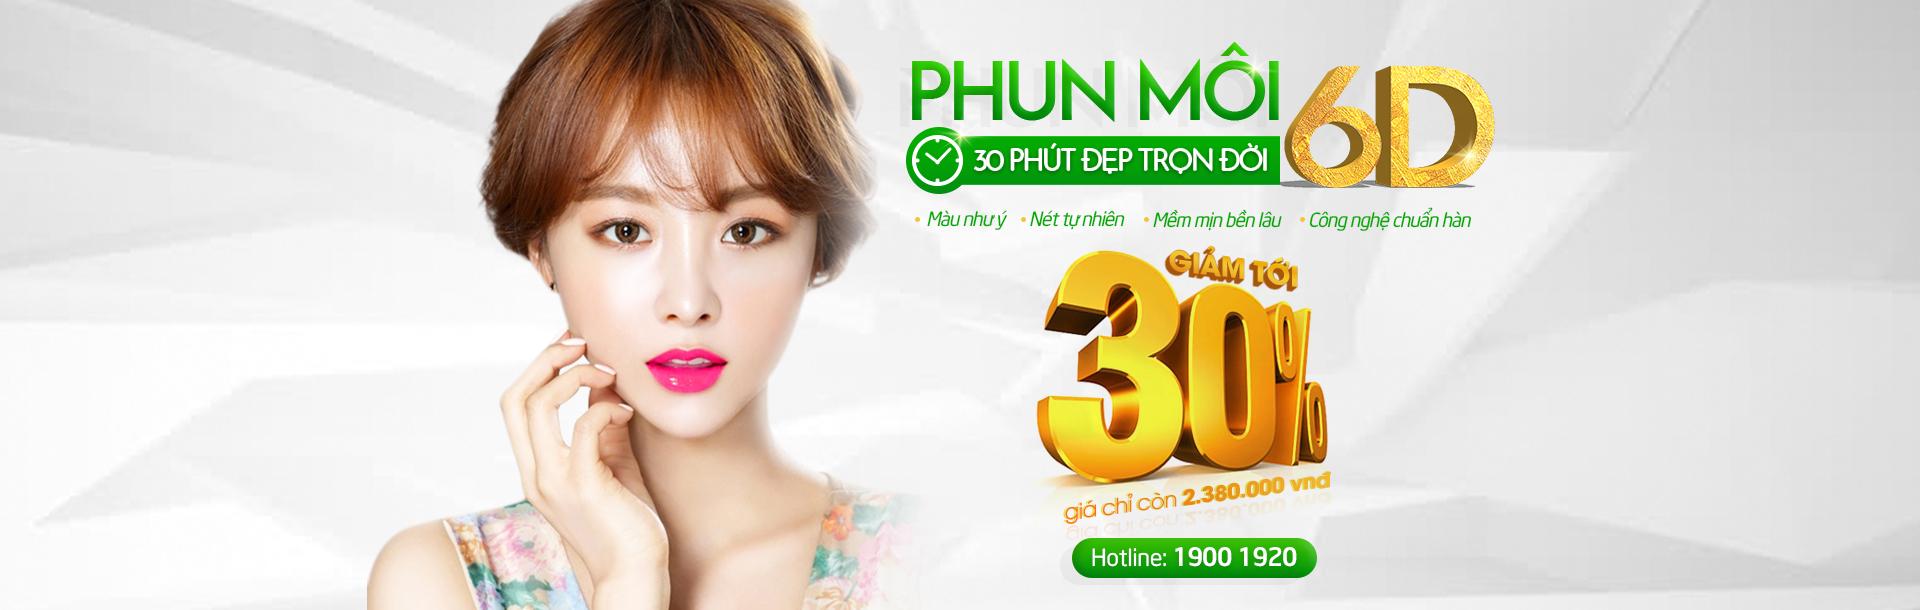 Banner-web-Phun-Moi-1920x610